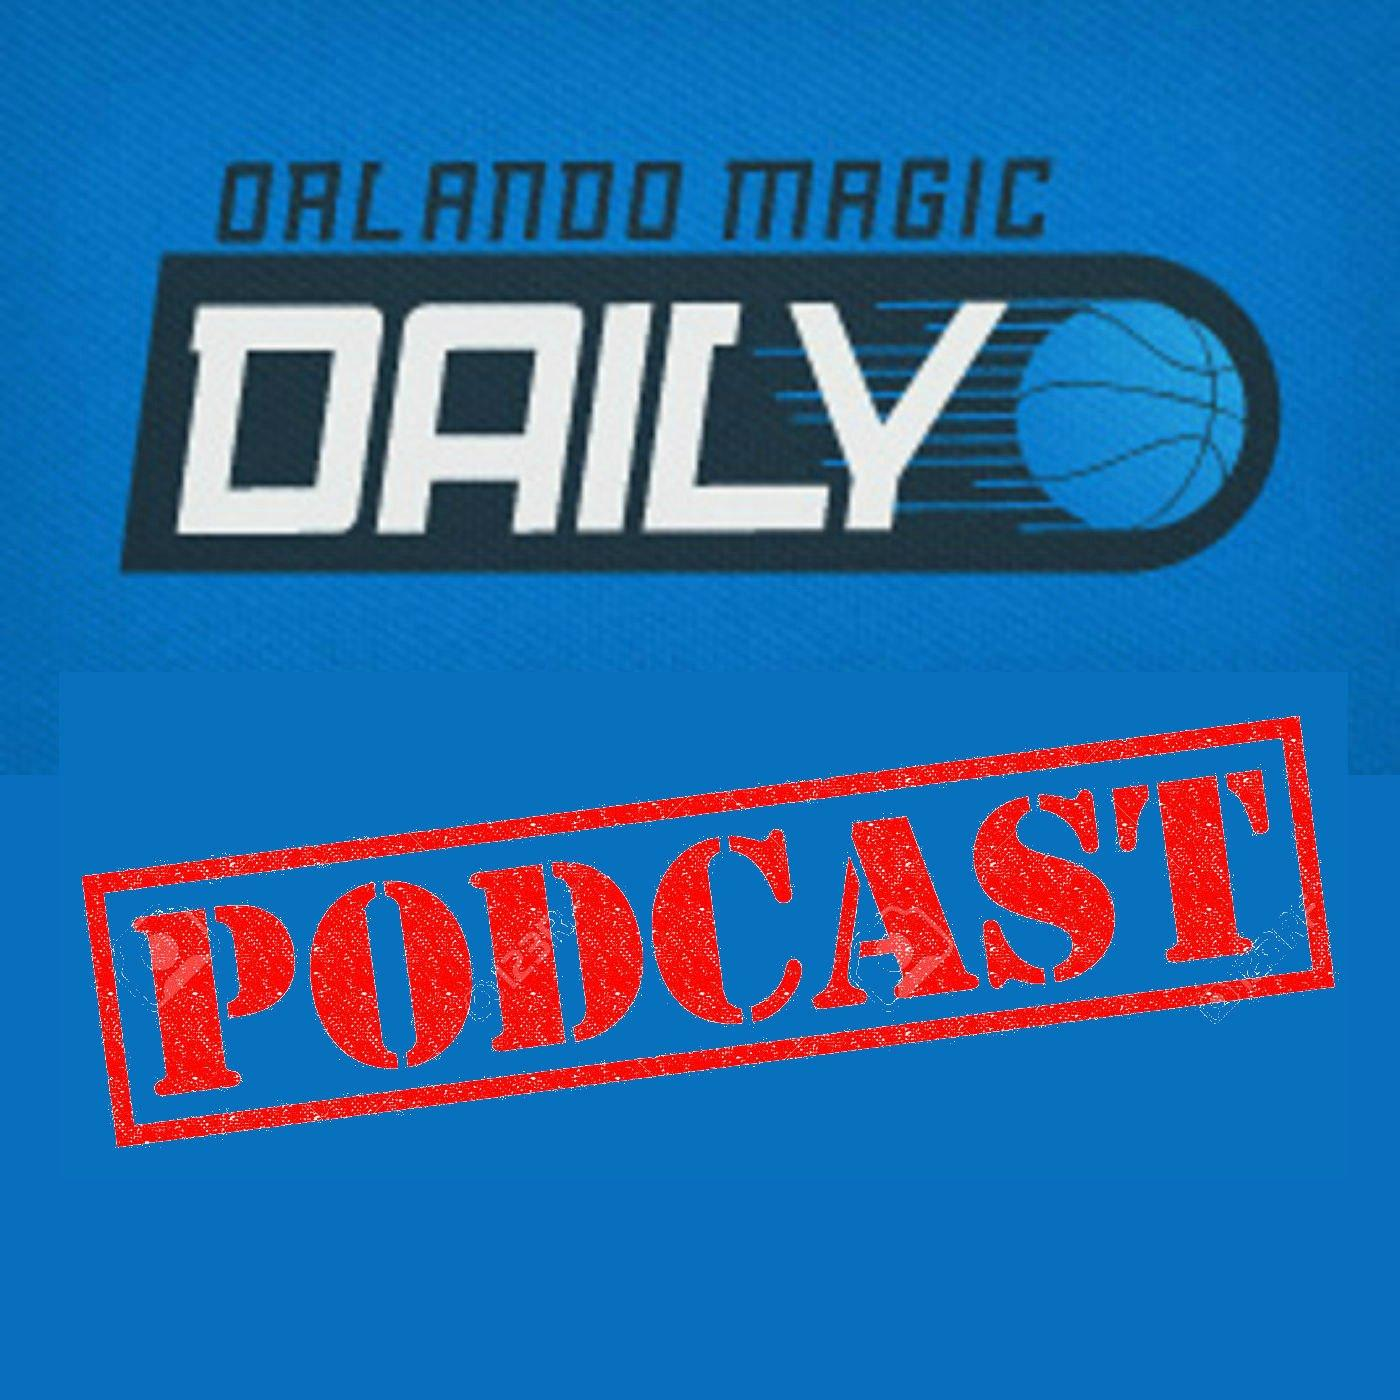 Orlando Magic Daily Podcast - Listen, Reviews, Charts